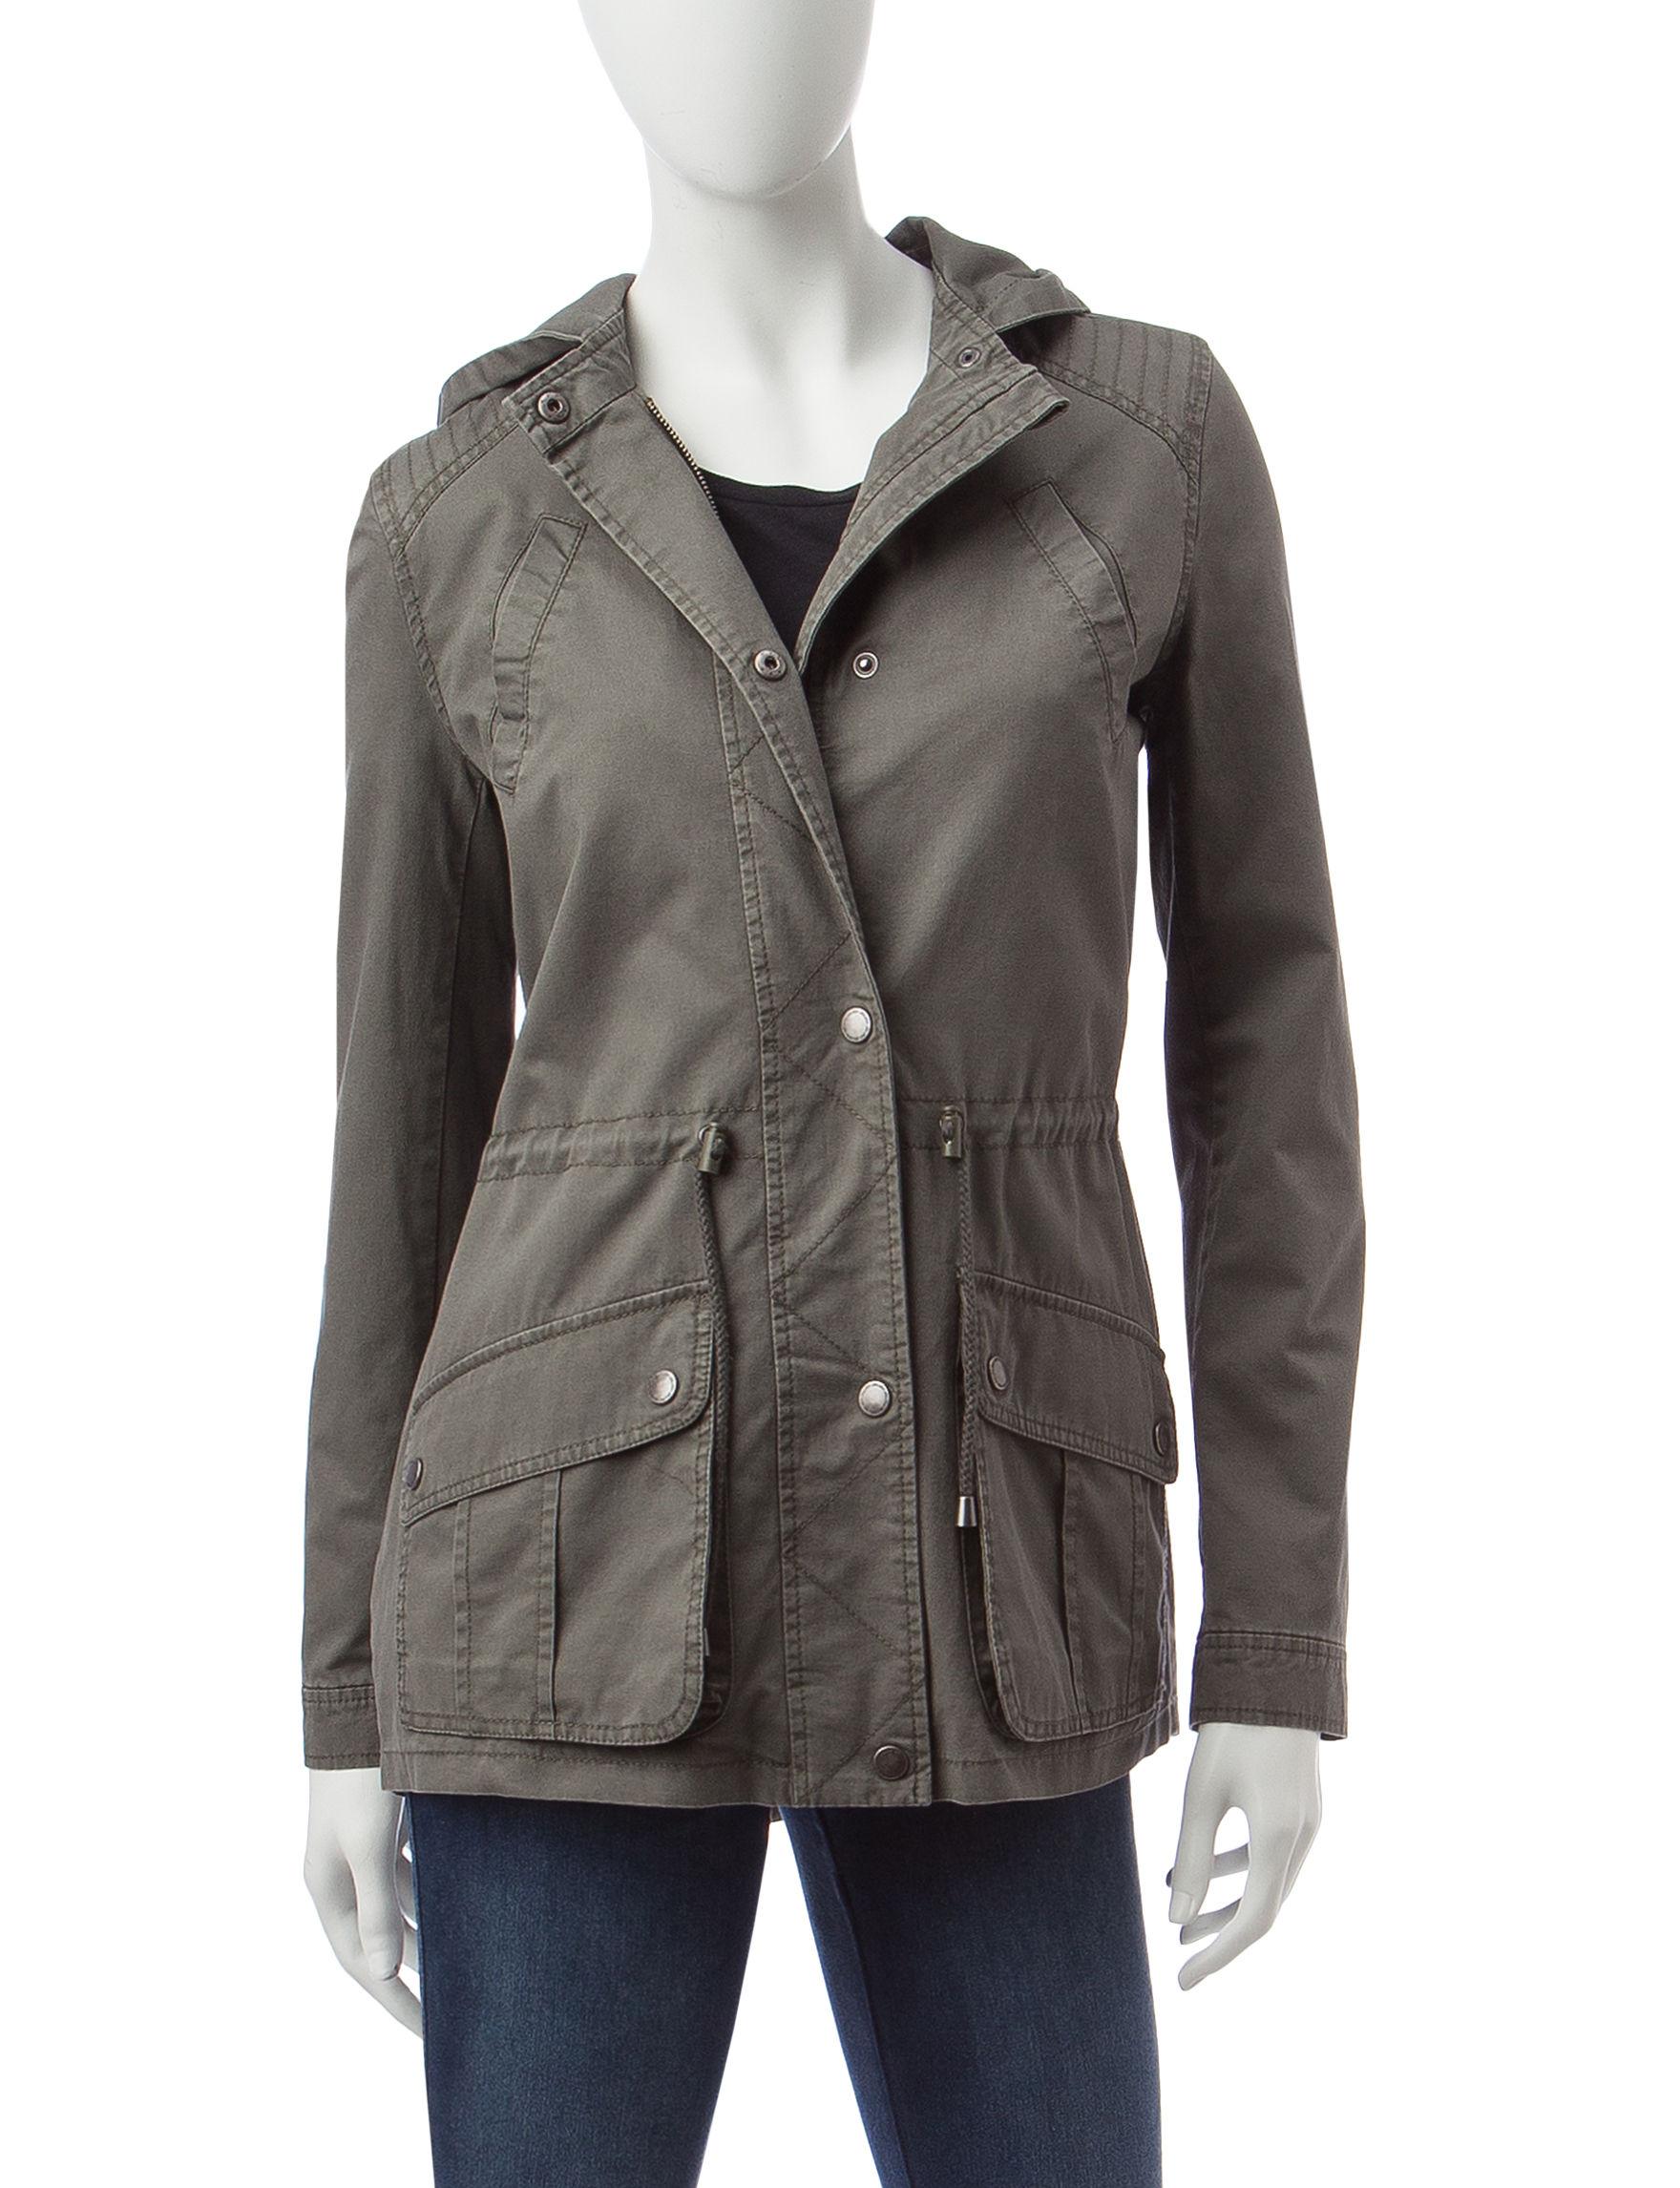 Jou-Jou Olive Lightweight Jackets & Blazers